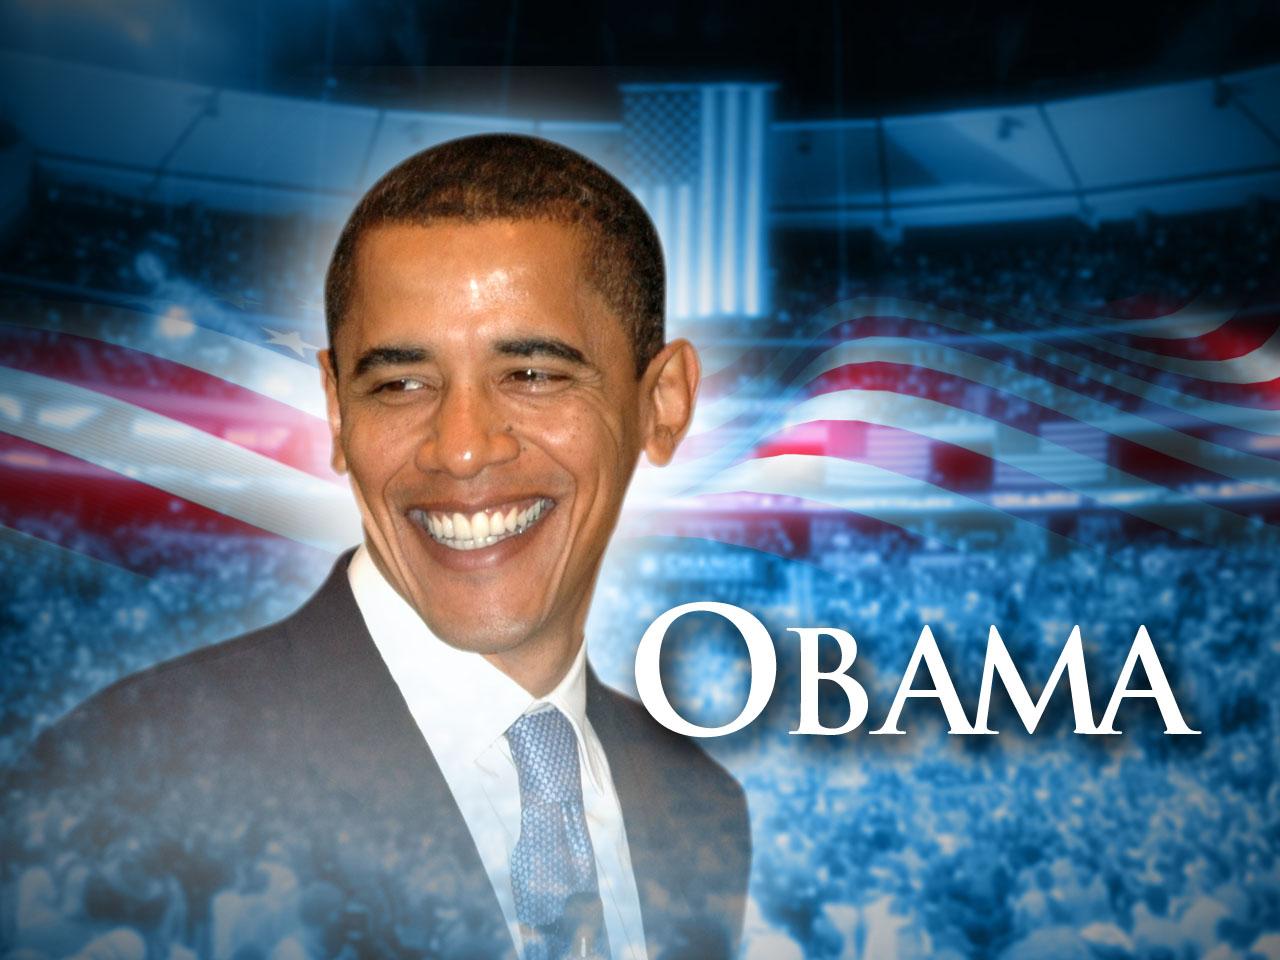 Obama Wallpaper 1280x960